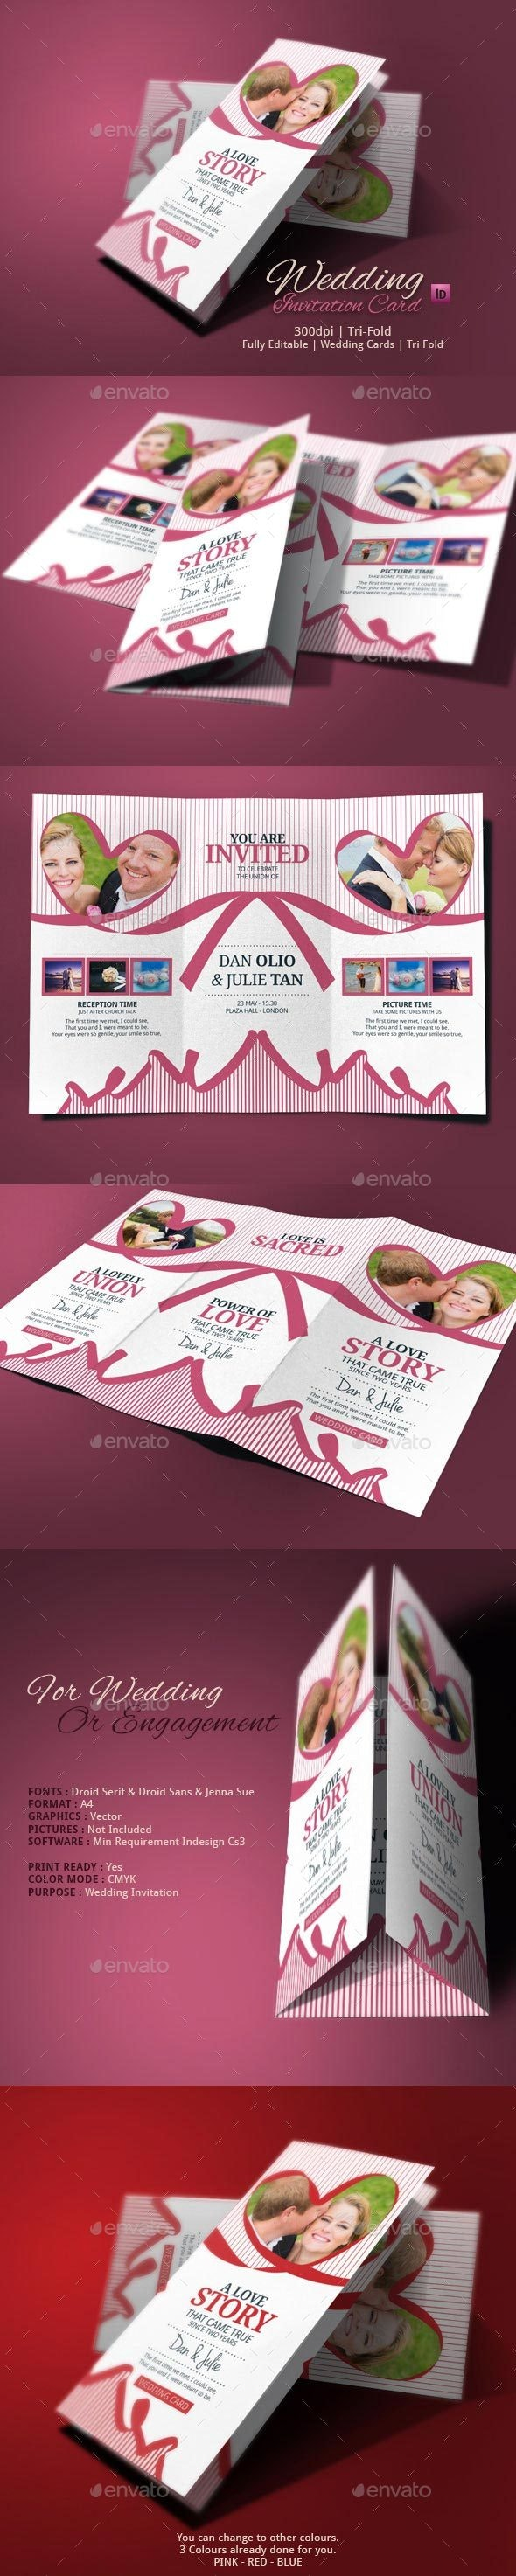 Tri Fold Wedding Invitation - Weddings Cards & Invites